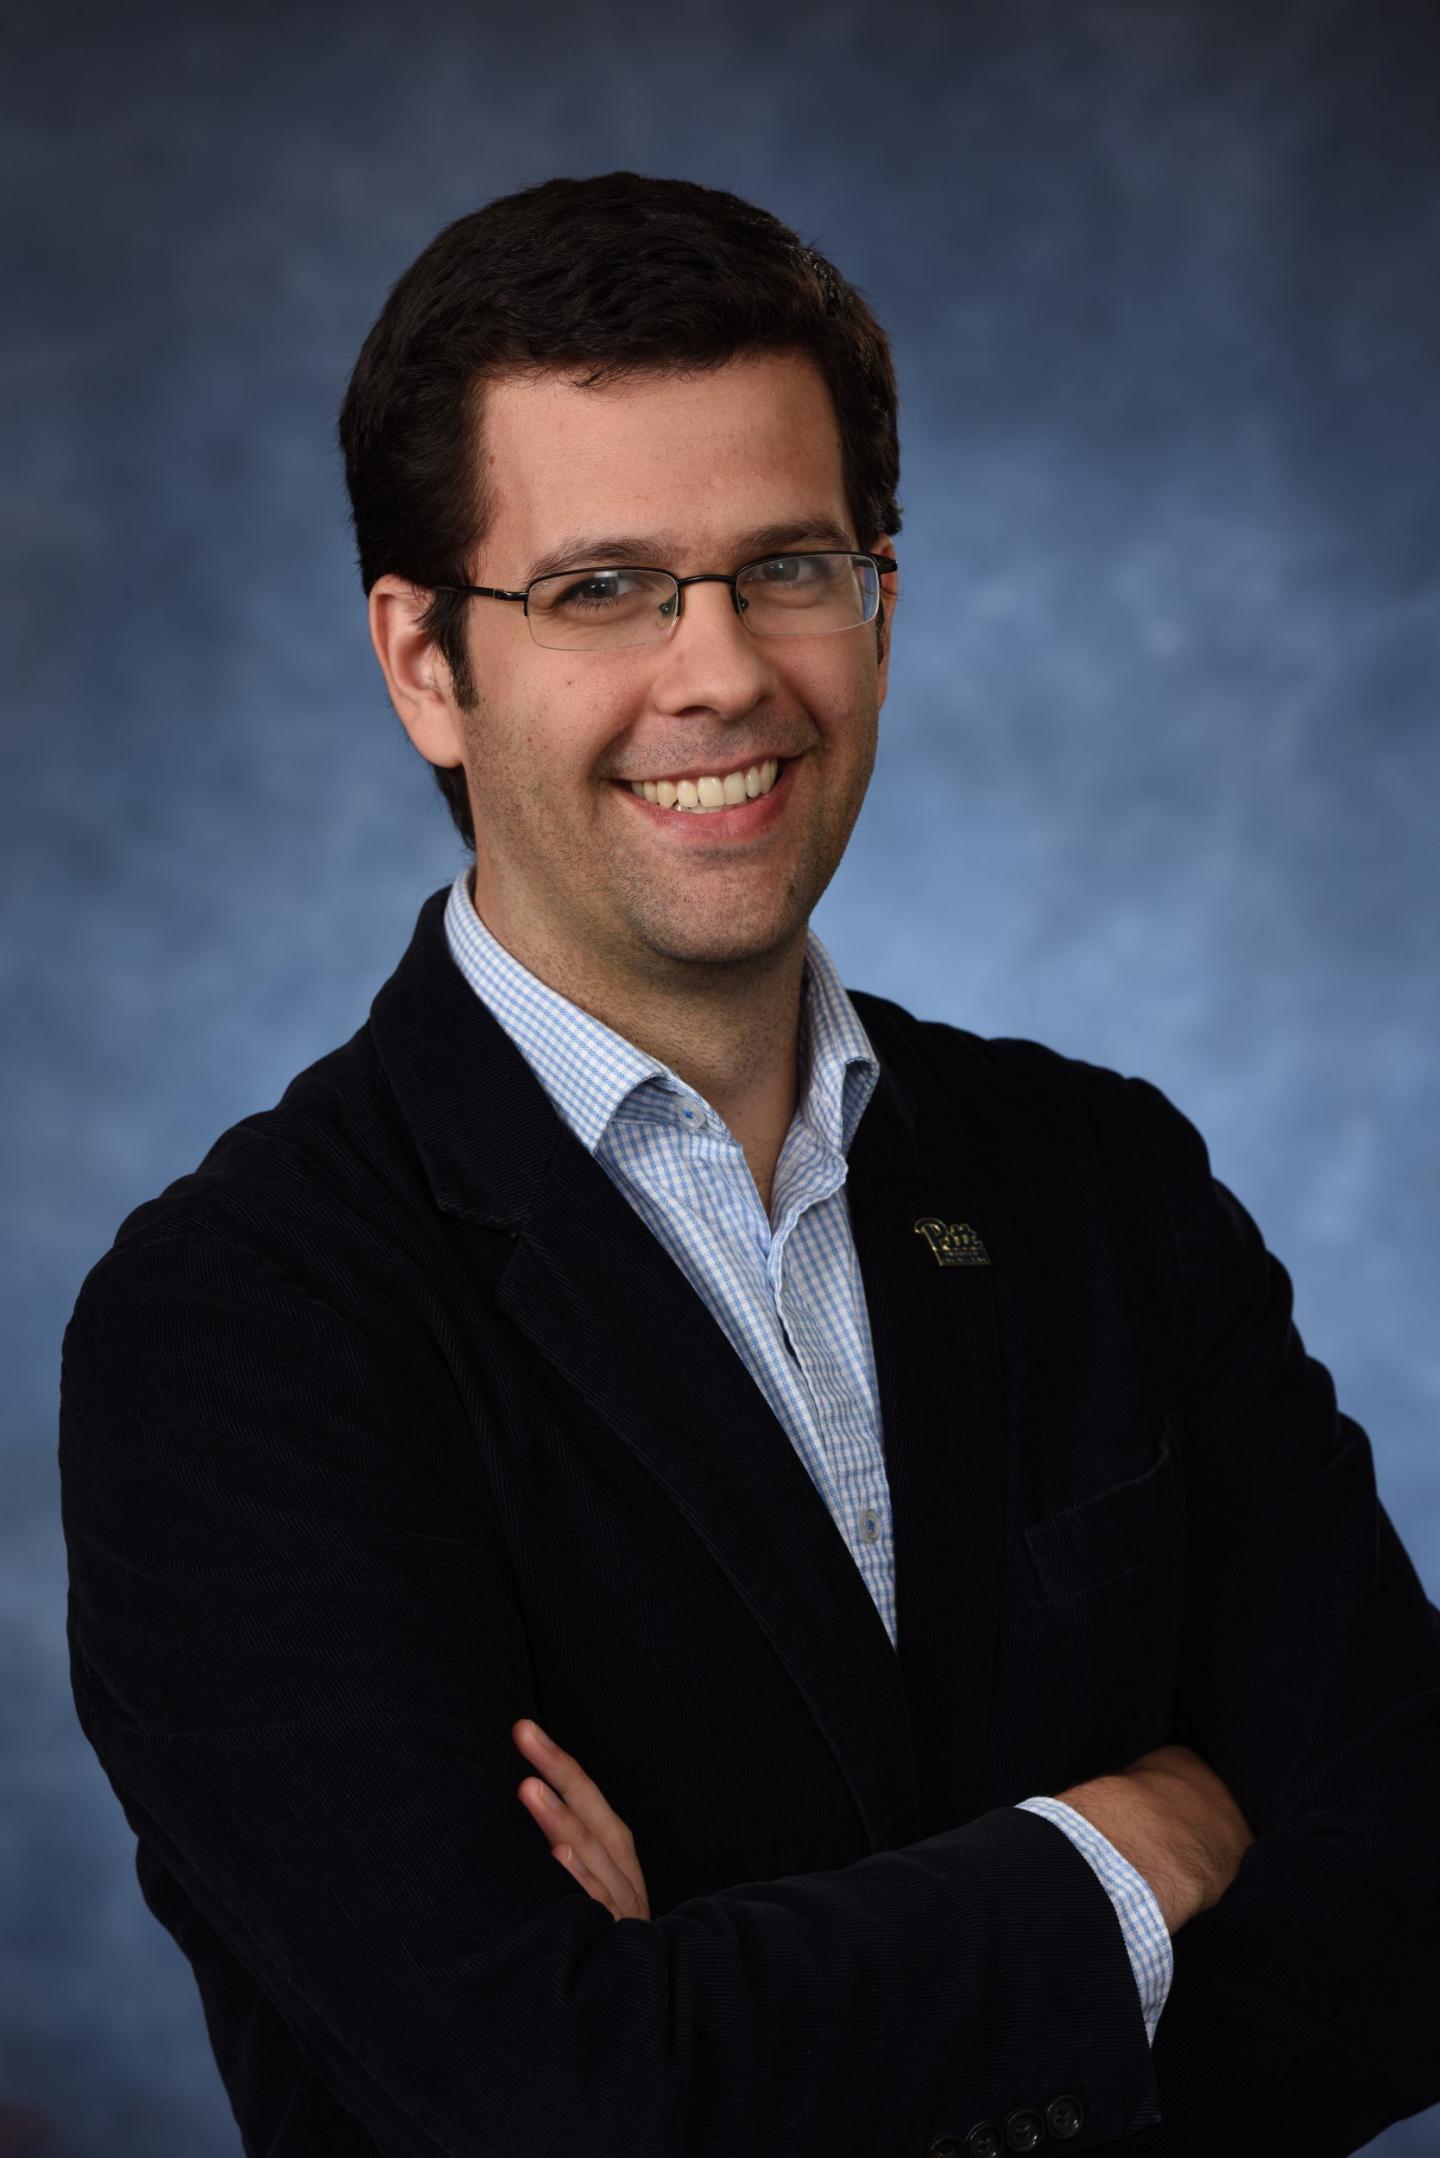 James McKone, University of Pittsburgh